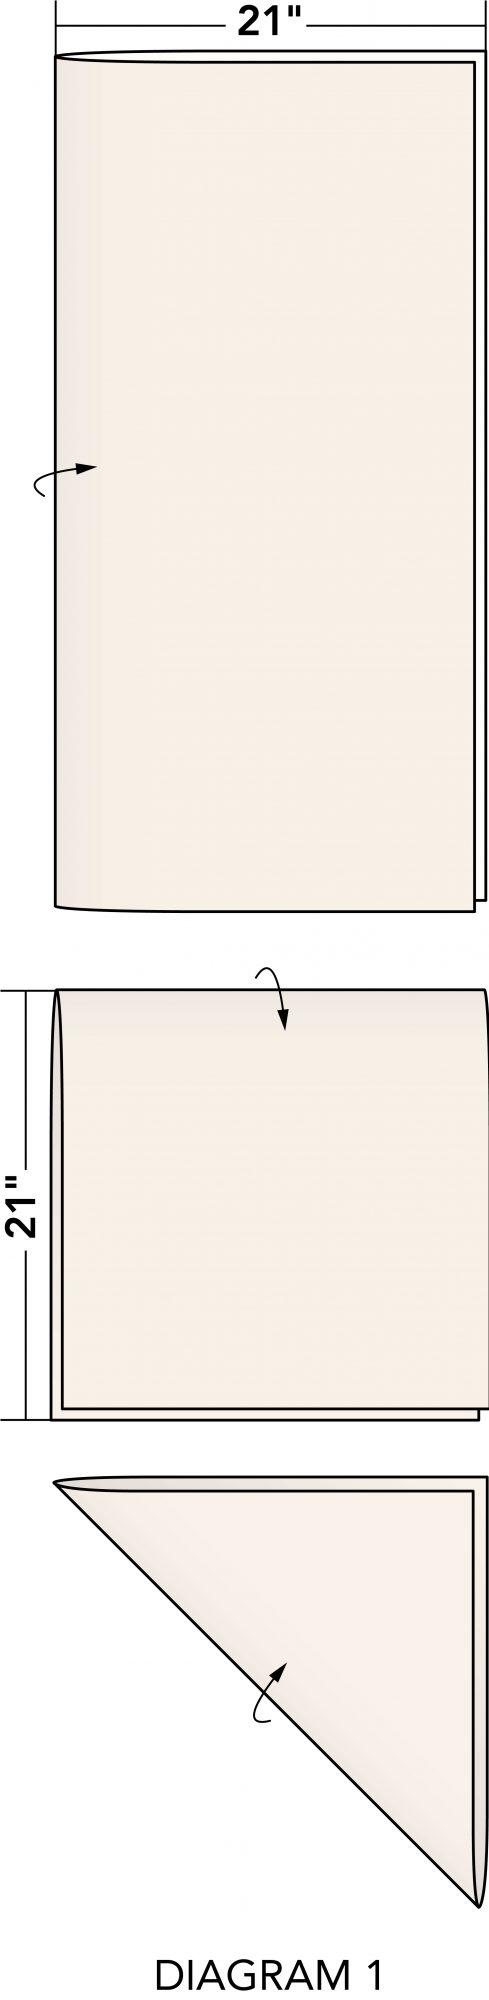 Shiny Baubles diagram 1